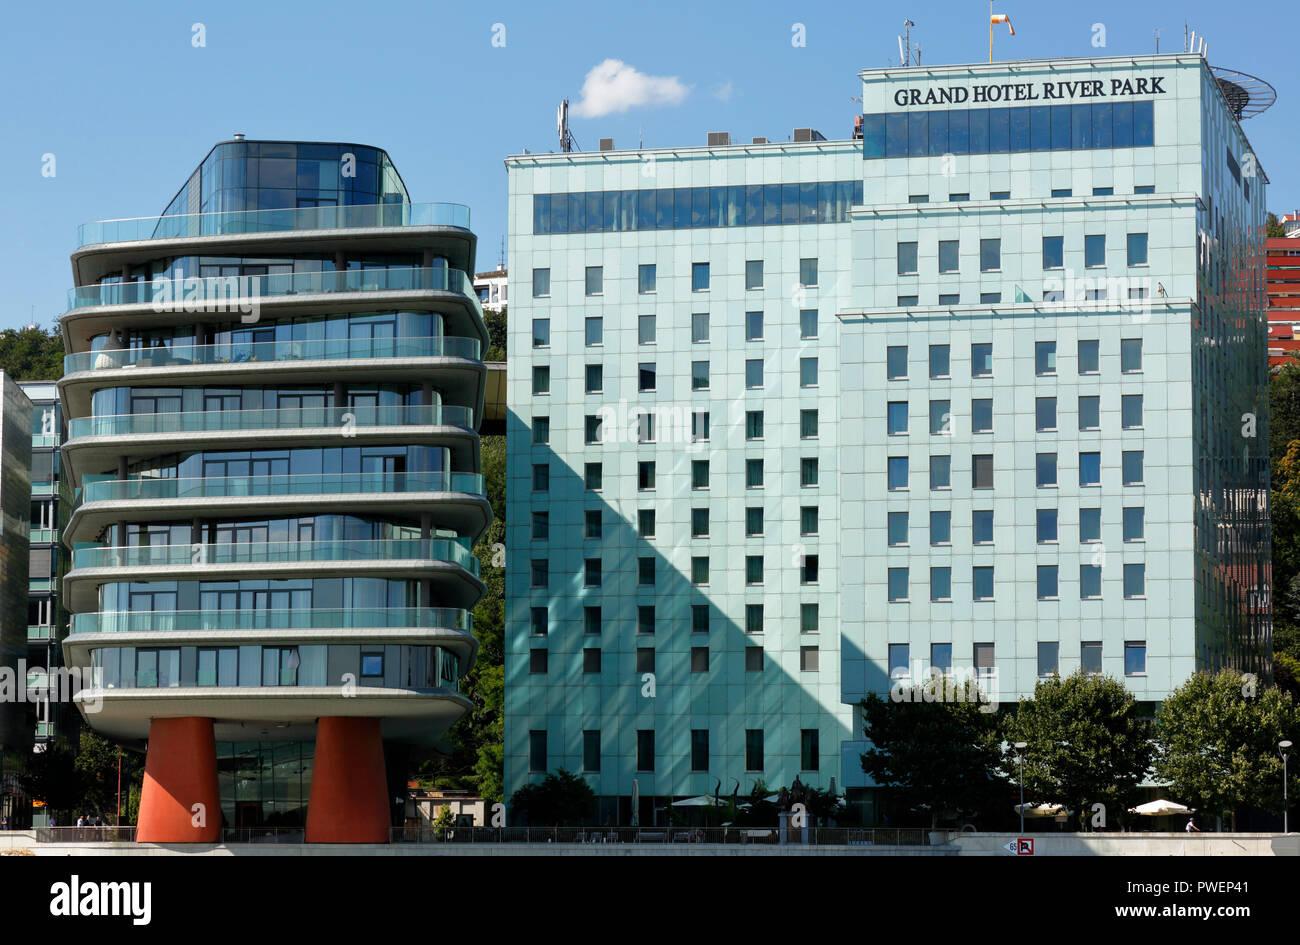 Slowakischen Republik Slowakei Bratislava Hauptstadt Donau Kleine Karpaten Grand Hotel River Park Am Ufer Der Donau Donauuferpromenade Stockfotografie Alamy